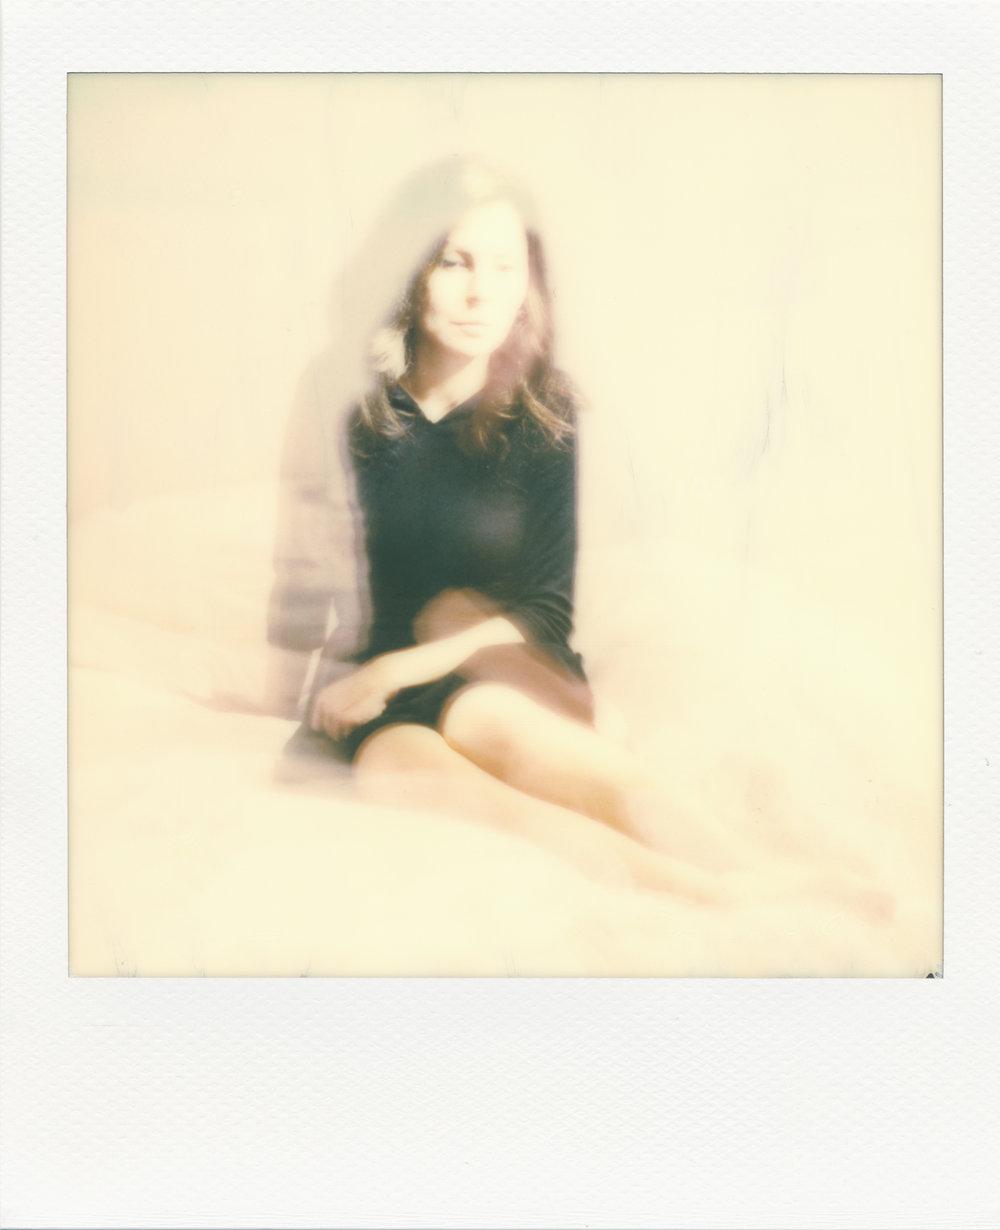 Jennifer_Rumbach_Polaroids_SG_1903_01.jpg